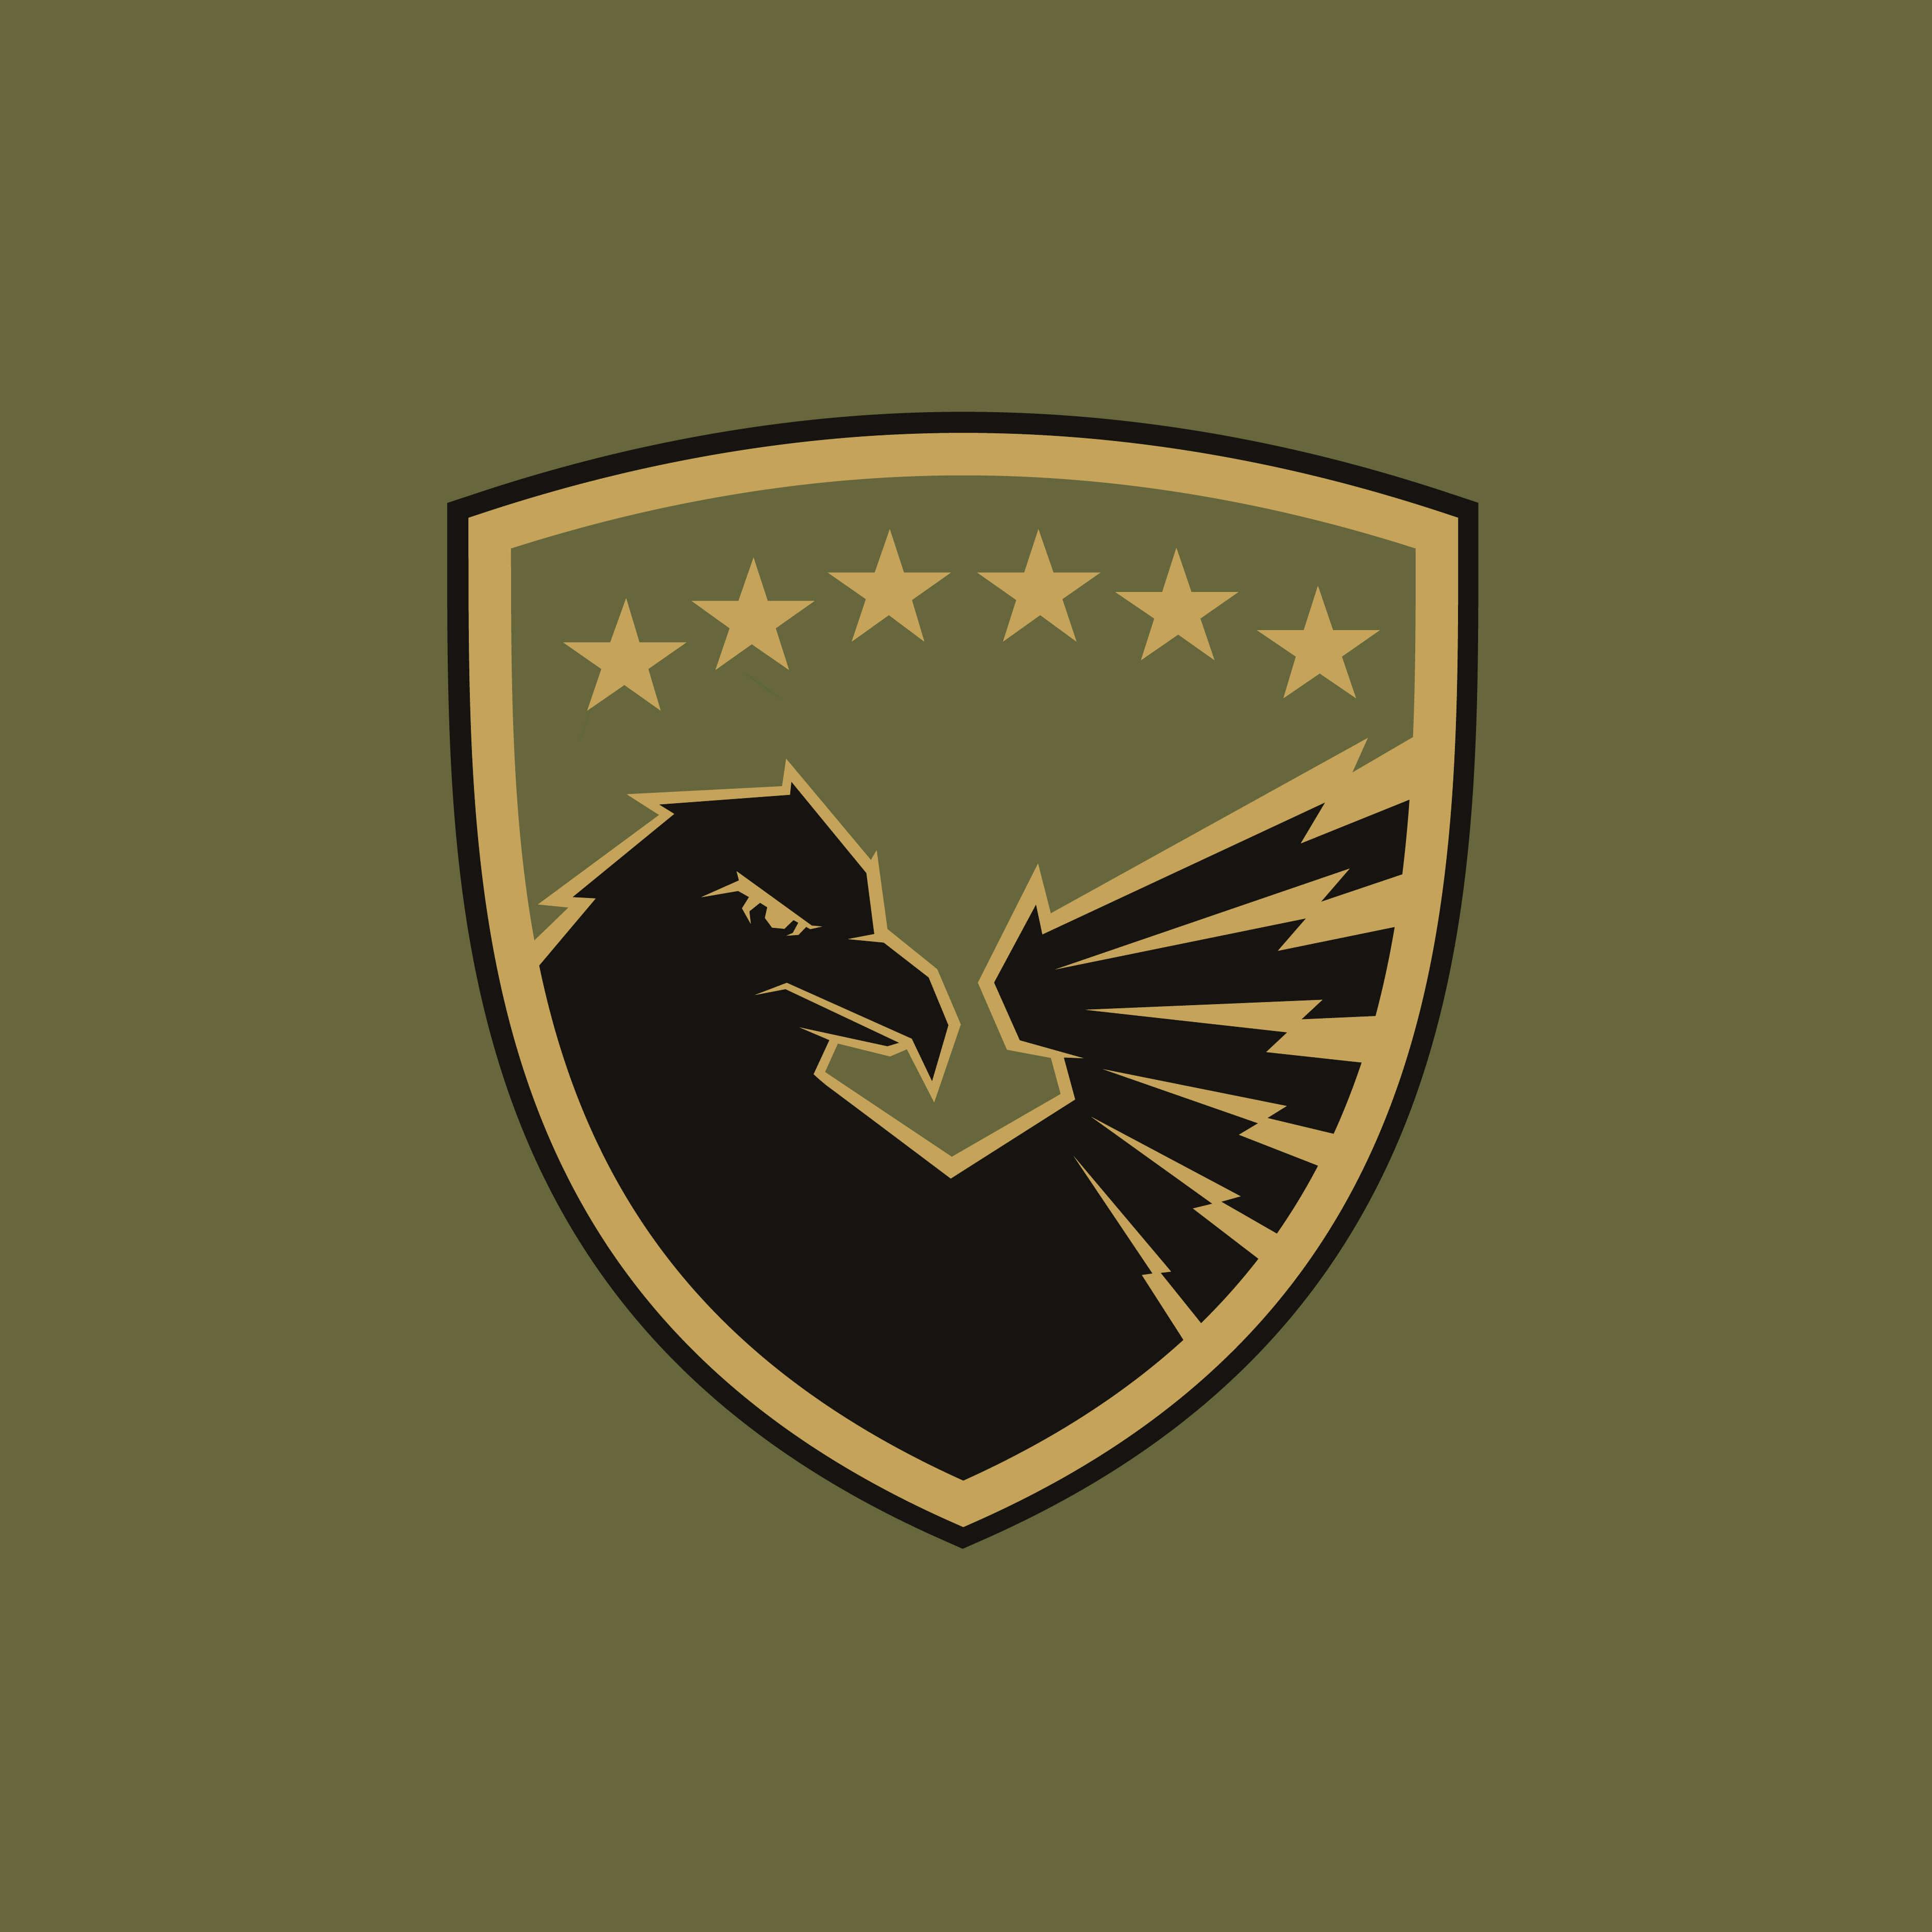 Kosovo Army Insignia